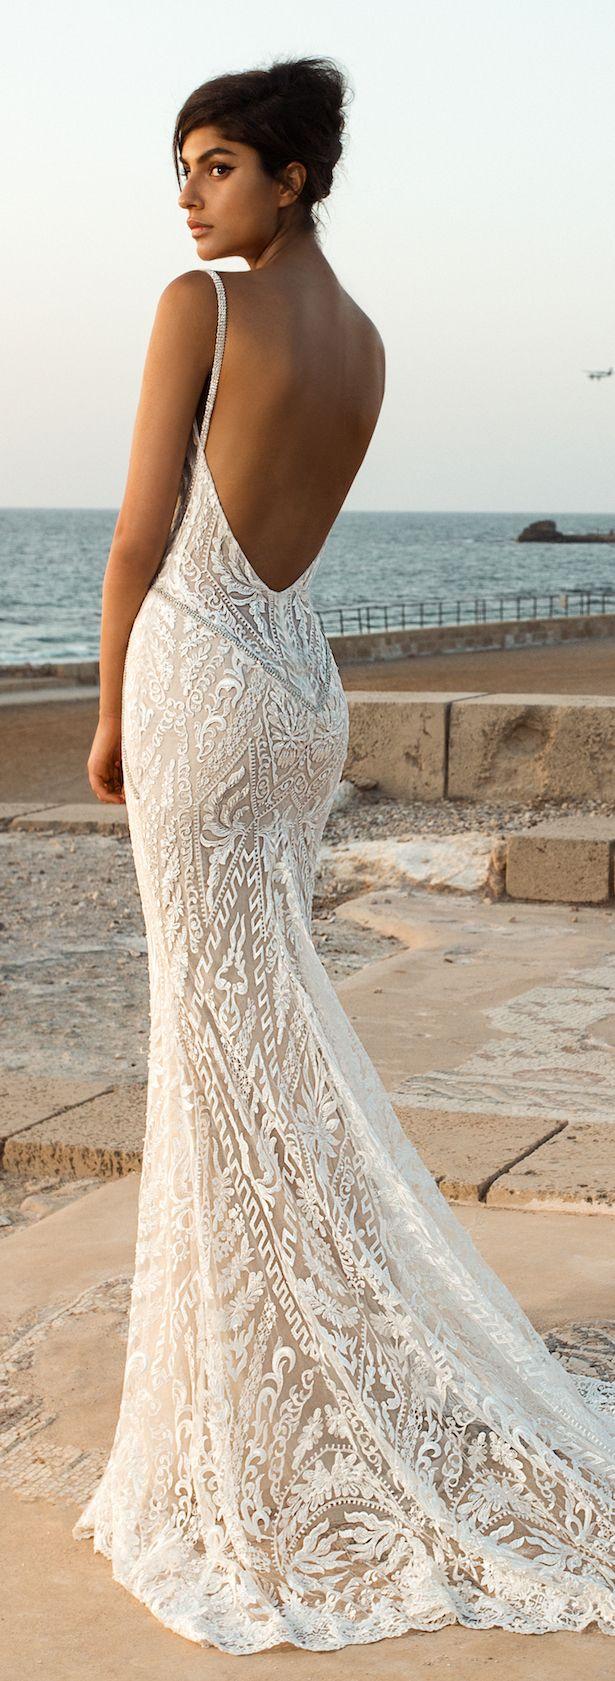 Gala by galia lahav collection no iii wedding dresses possibility